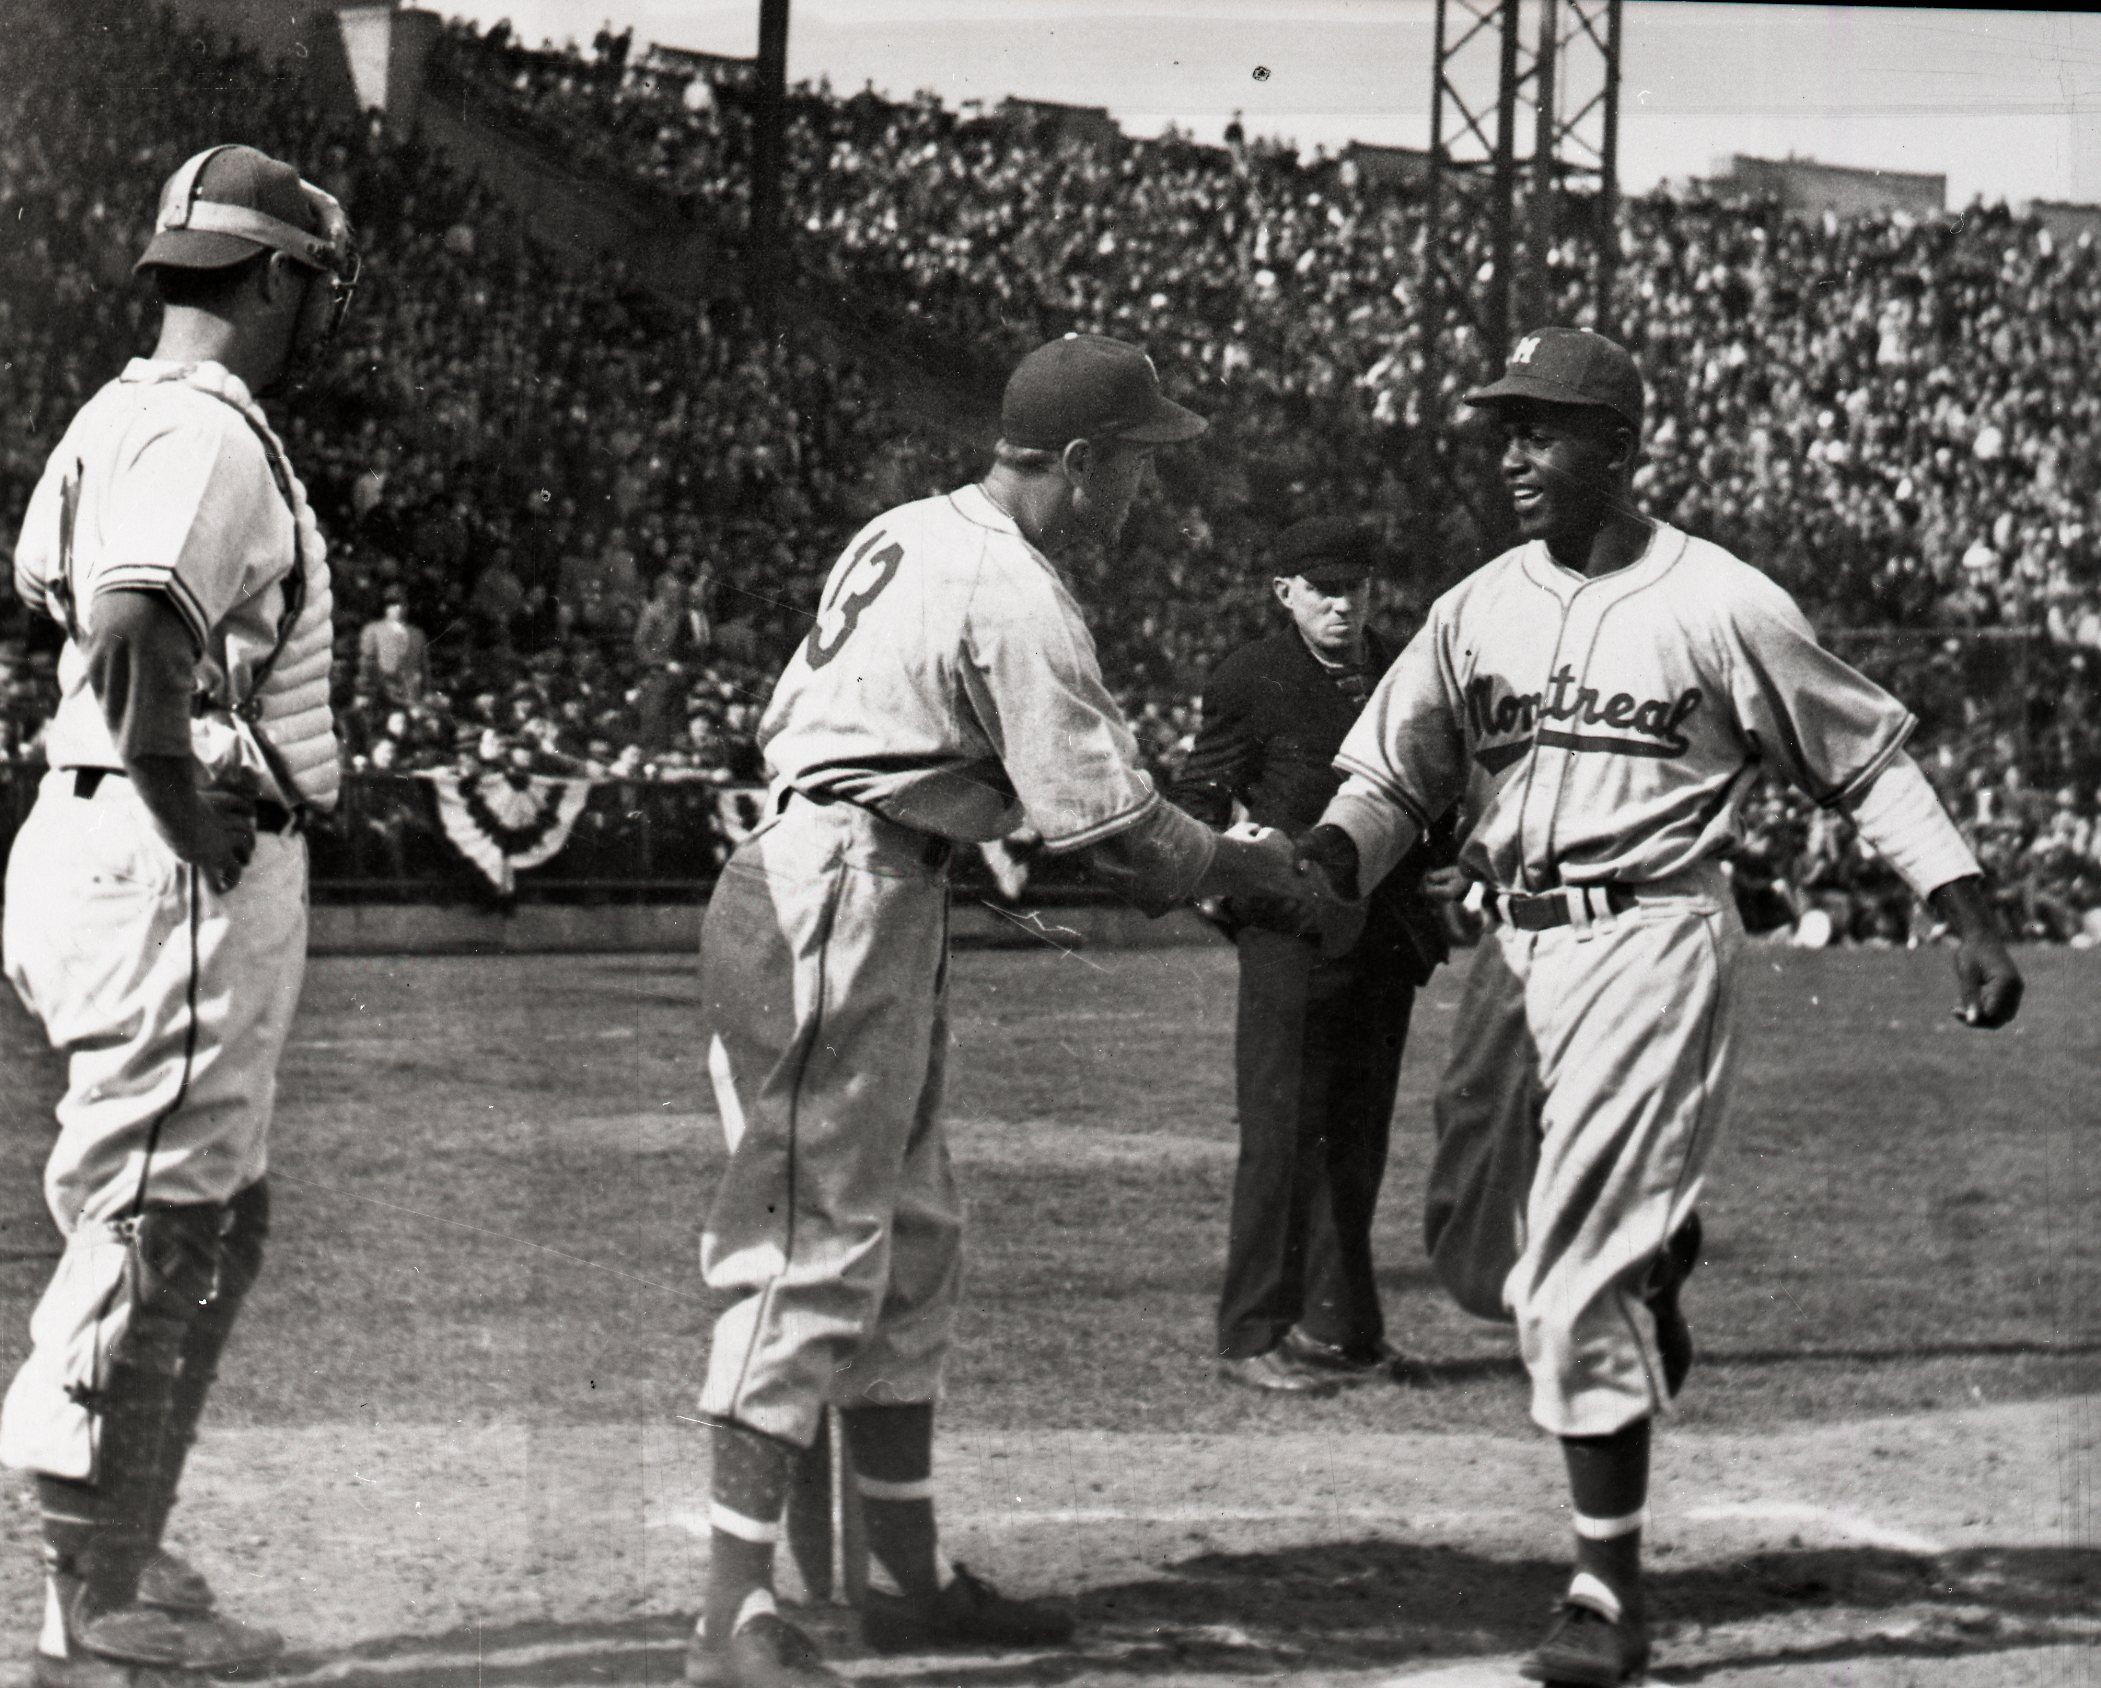 1924 Negro League World Series, Hilldale of Darby, PA vs. Kansas City  Monarchs.Hank Greenberg and Joe LouisOpening Day at Jersey City, April 18,  1946.